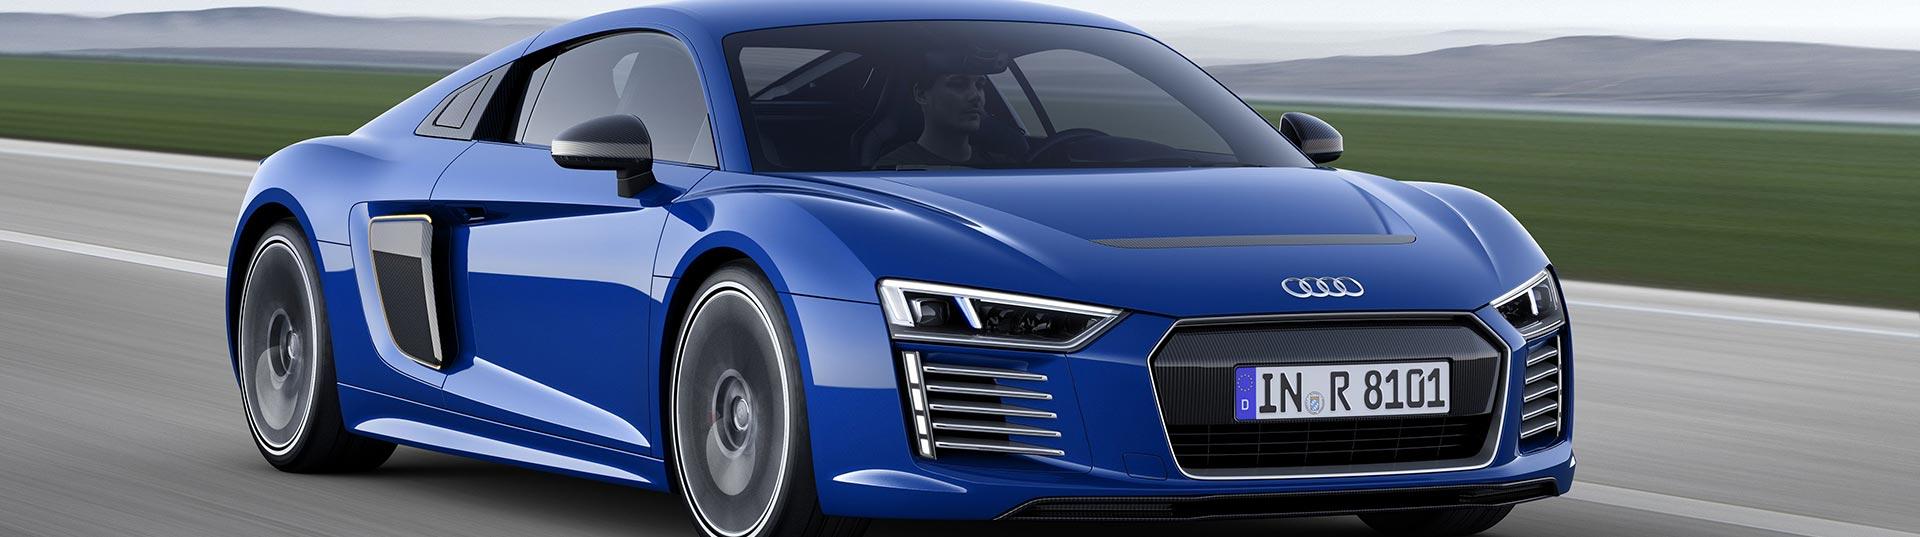 Audi descontinua R8 e-tron